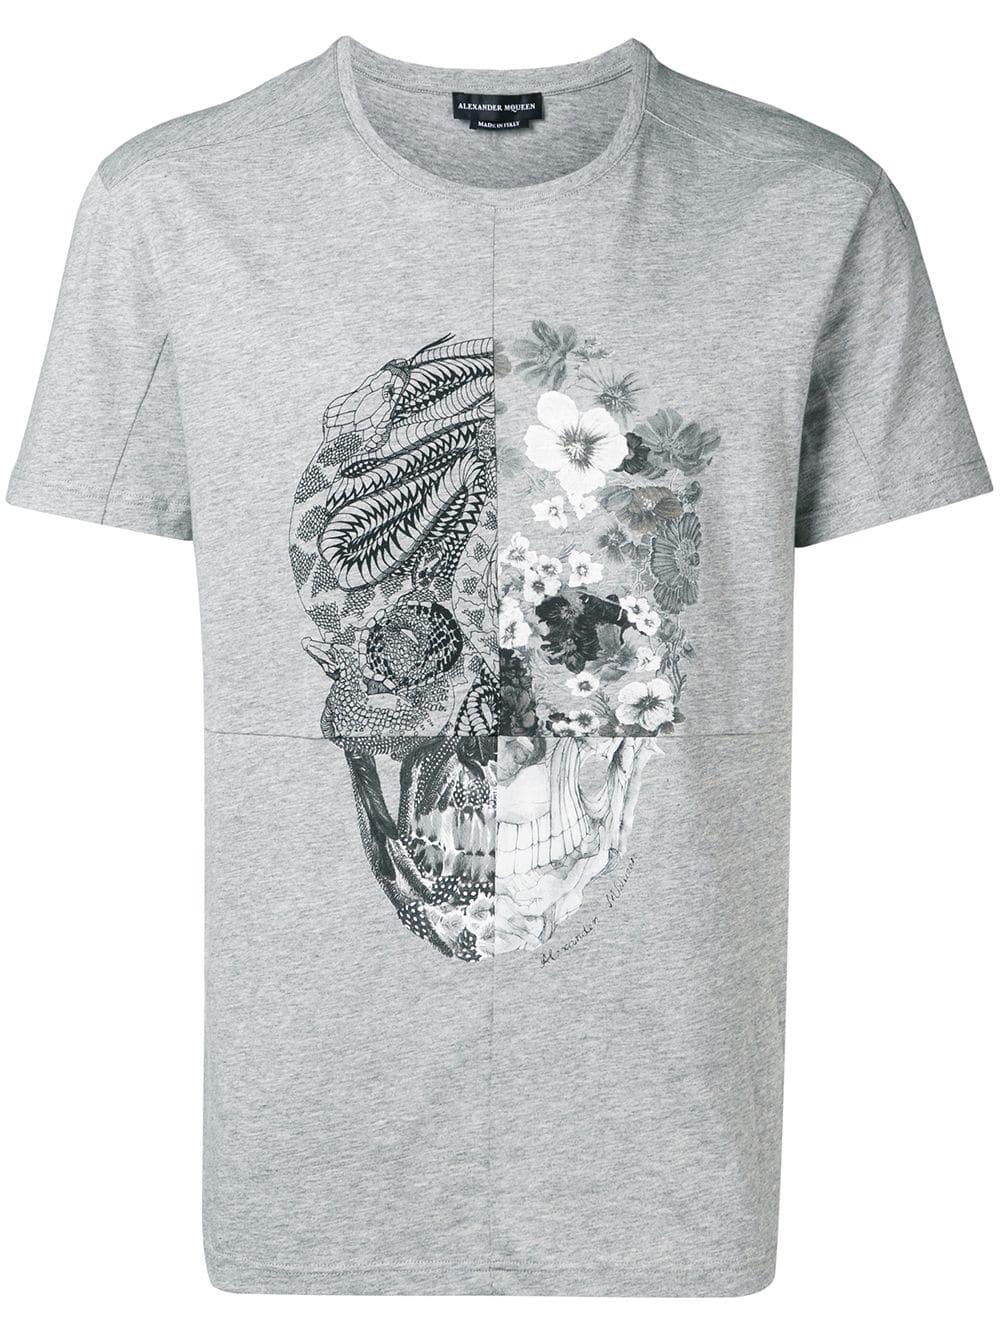 bc7364121 T-Shirt with patchwork Skull - ALEXANDER MCQUEEN - Russocapri